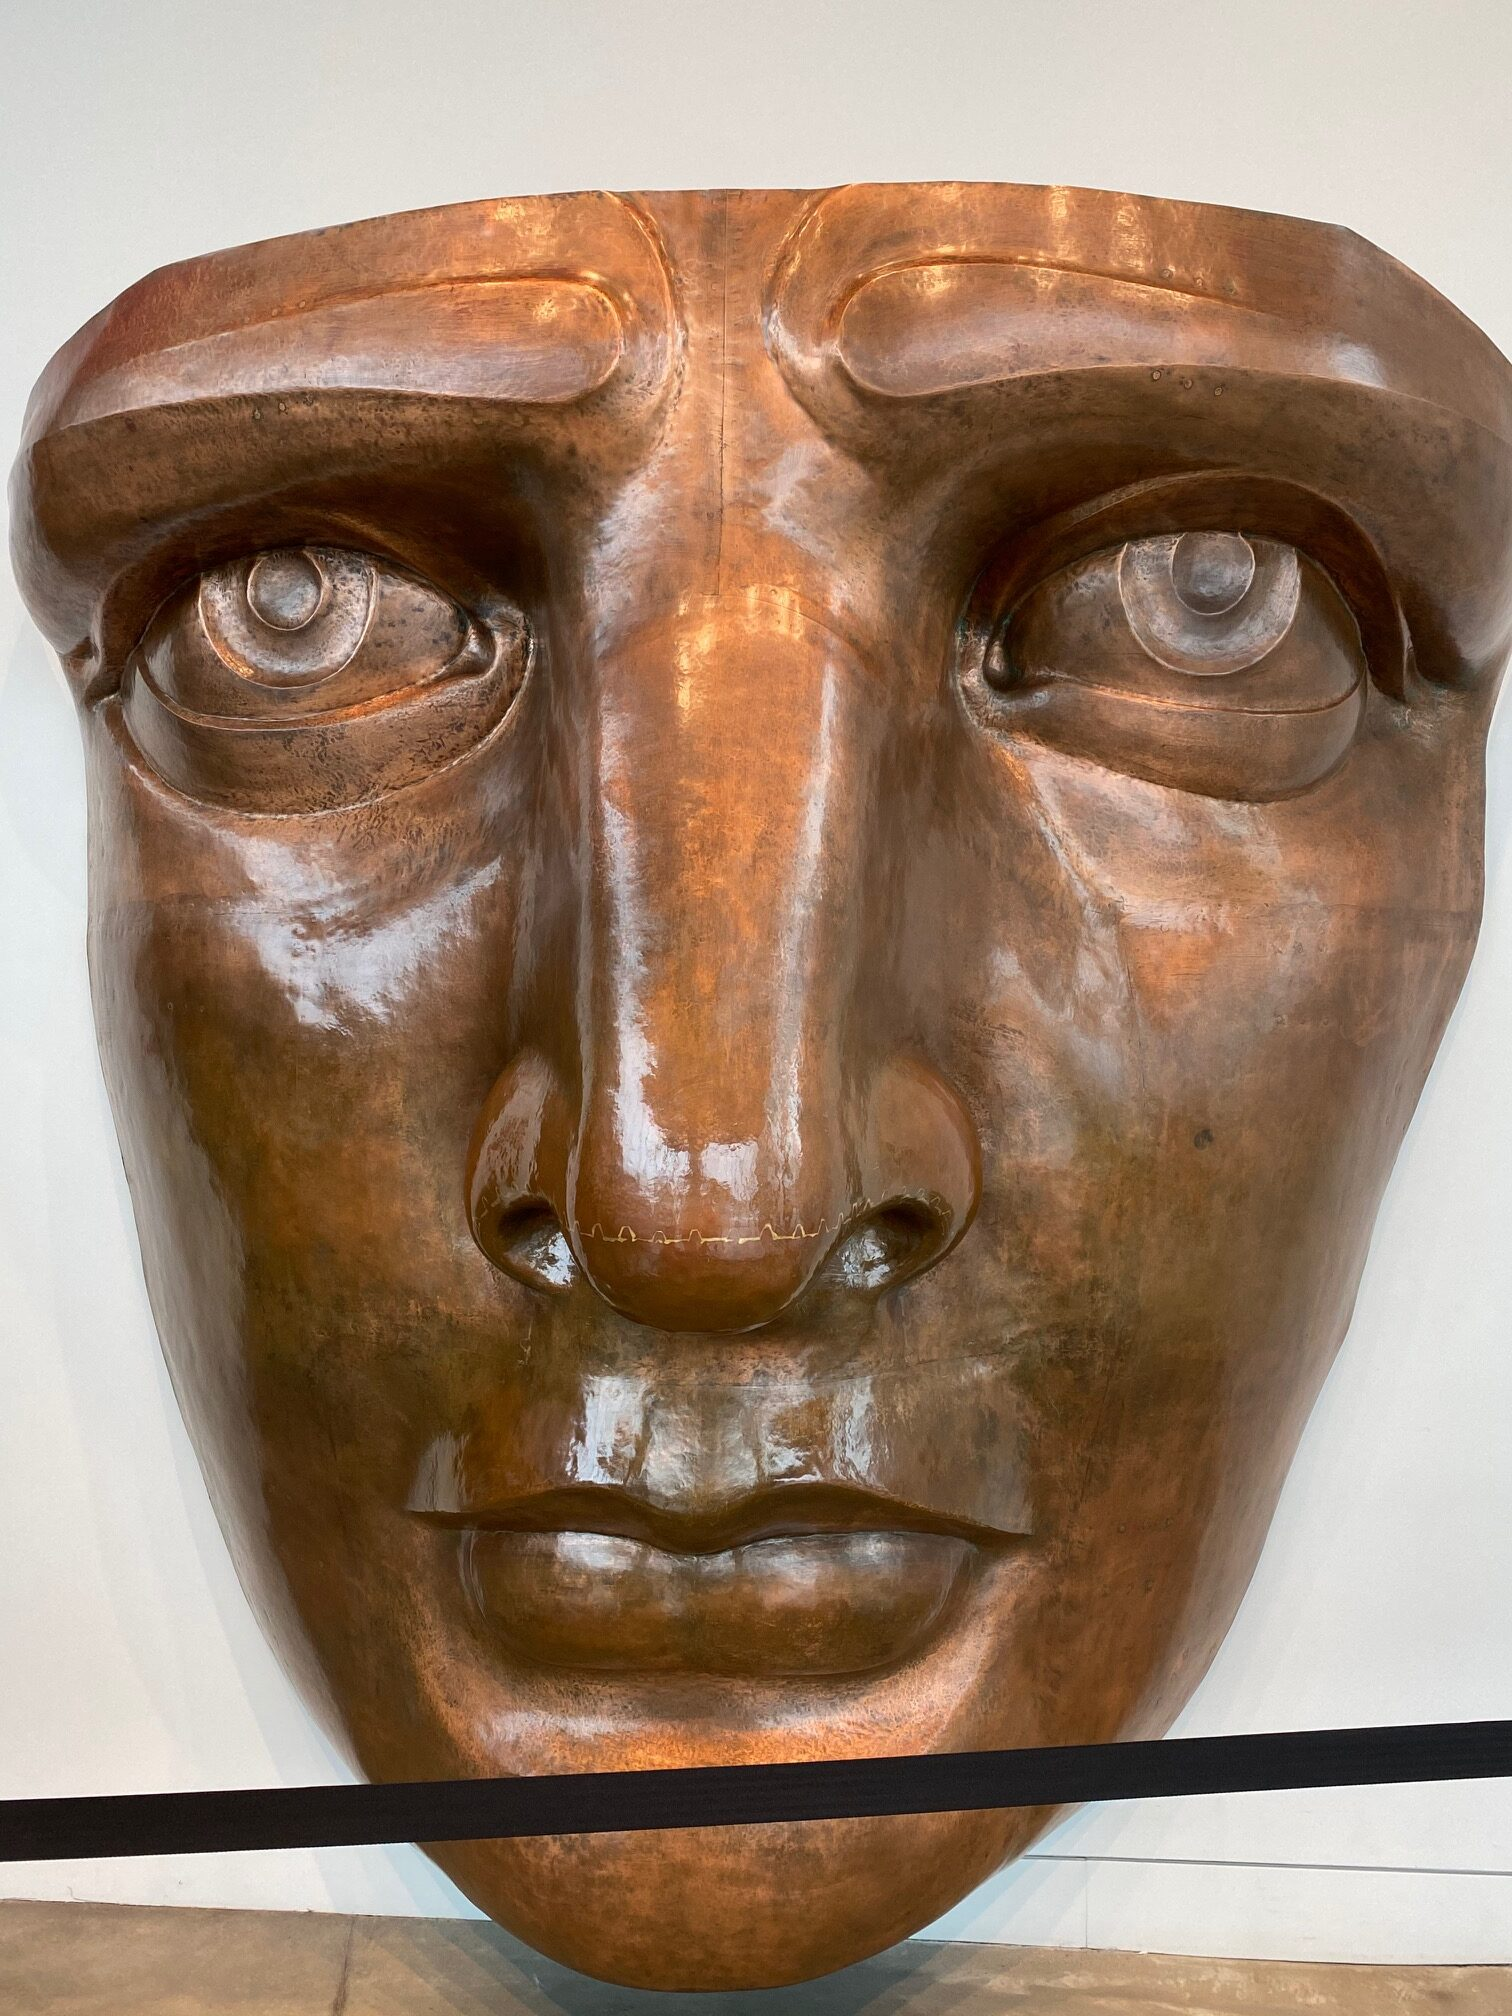 replica of statue of liberty's face